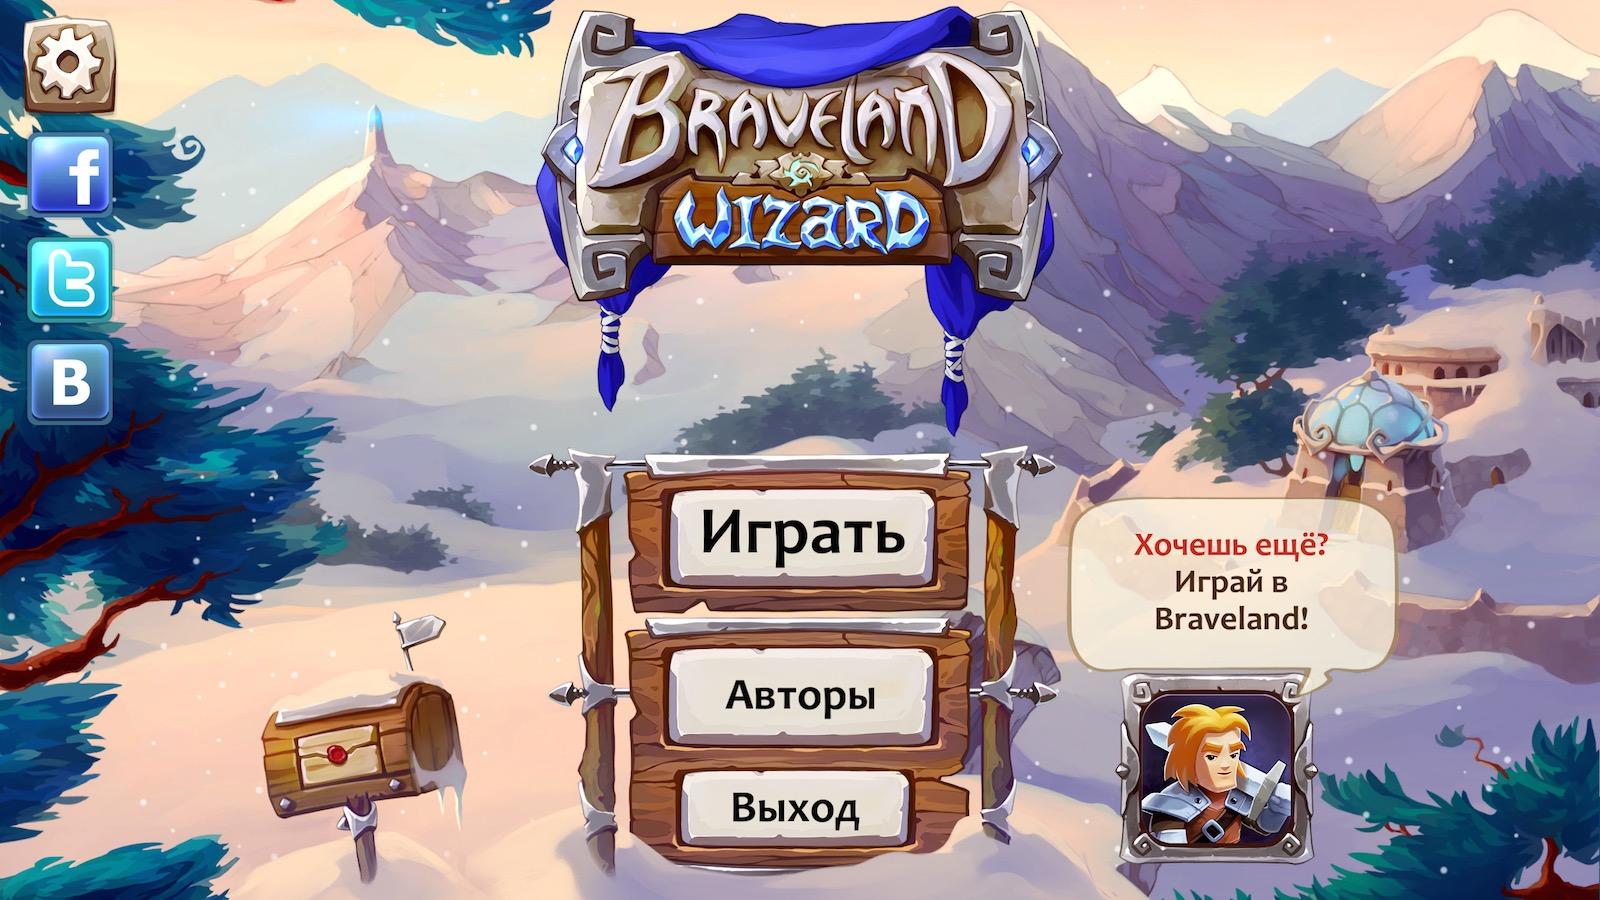 braveland wizard mag chn v yni hrabrozem ya 2 - Braveland Wizard: магічні війни Храброземья